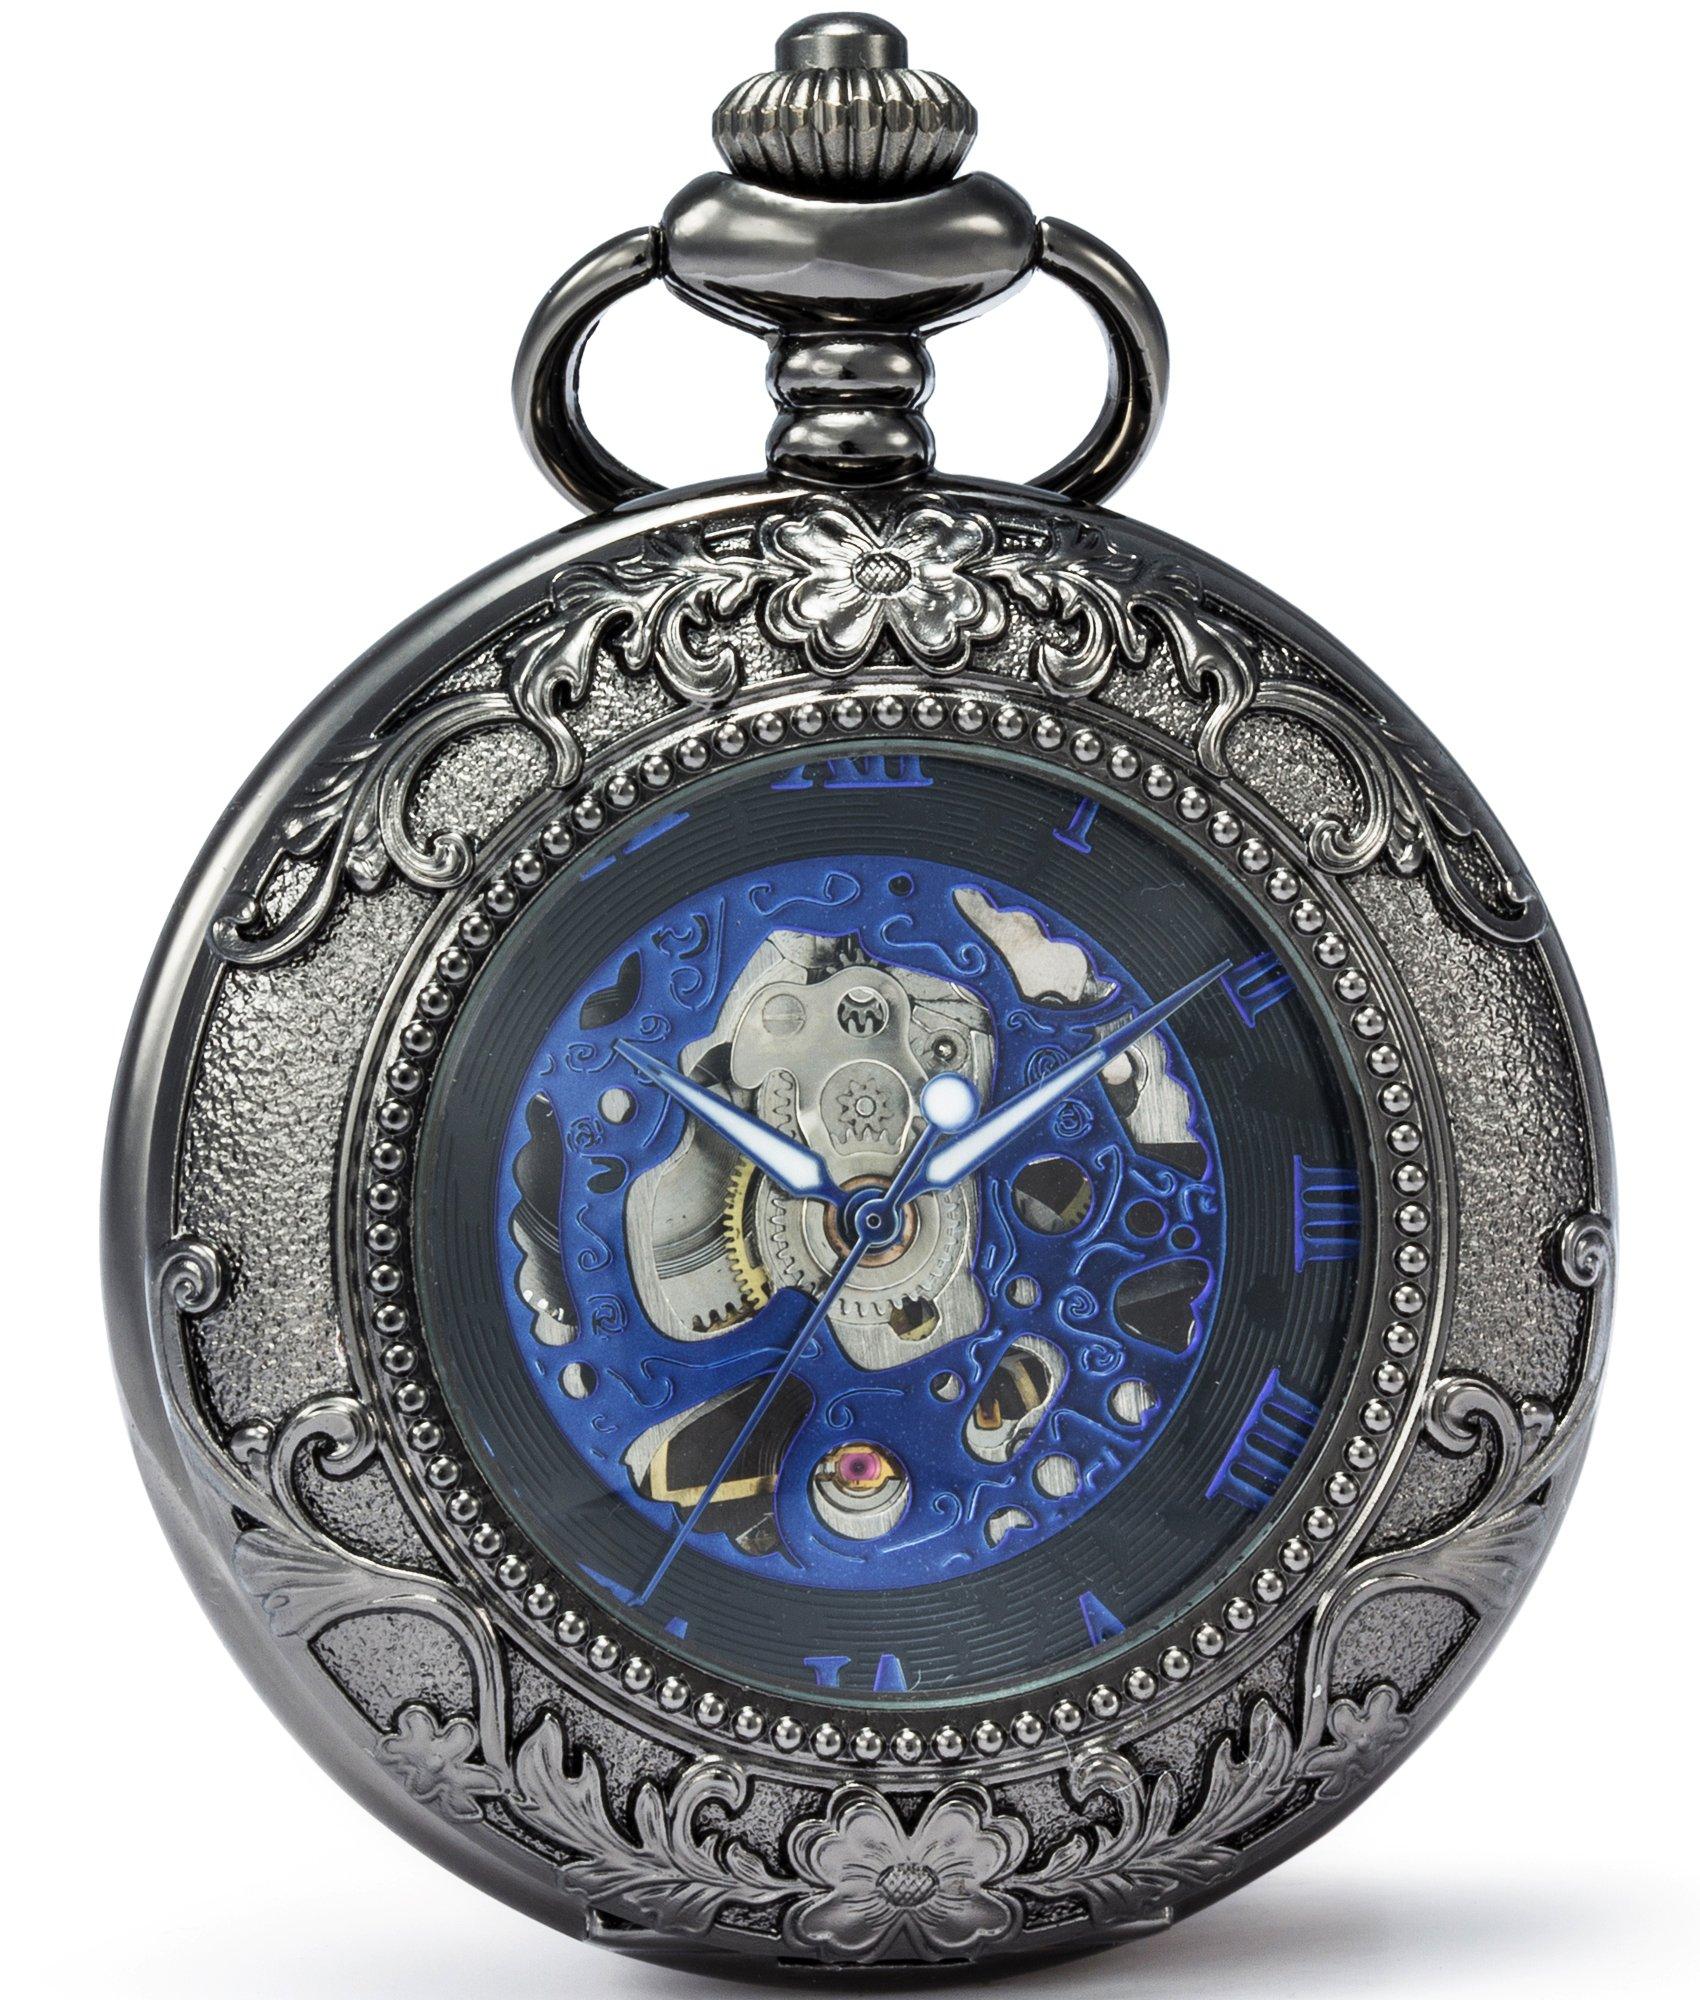 SEWOR Vintage Magnifier Skeleton Pocket Watch Mechanical Hand Wind Pocket Watch Include Brand Leather Box (Black)